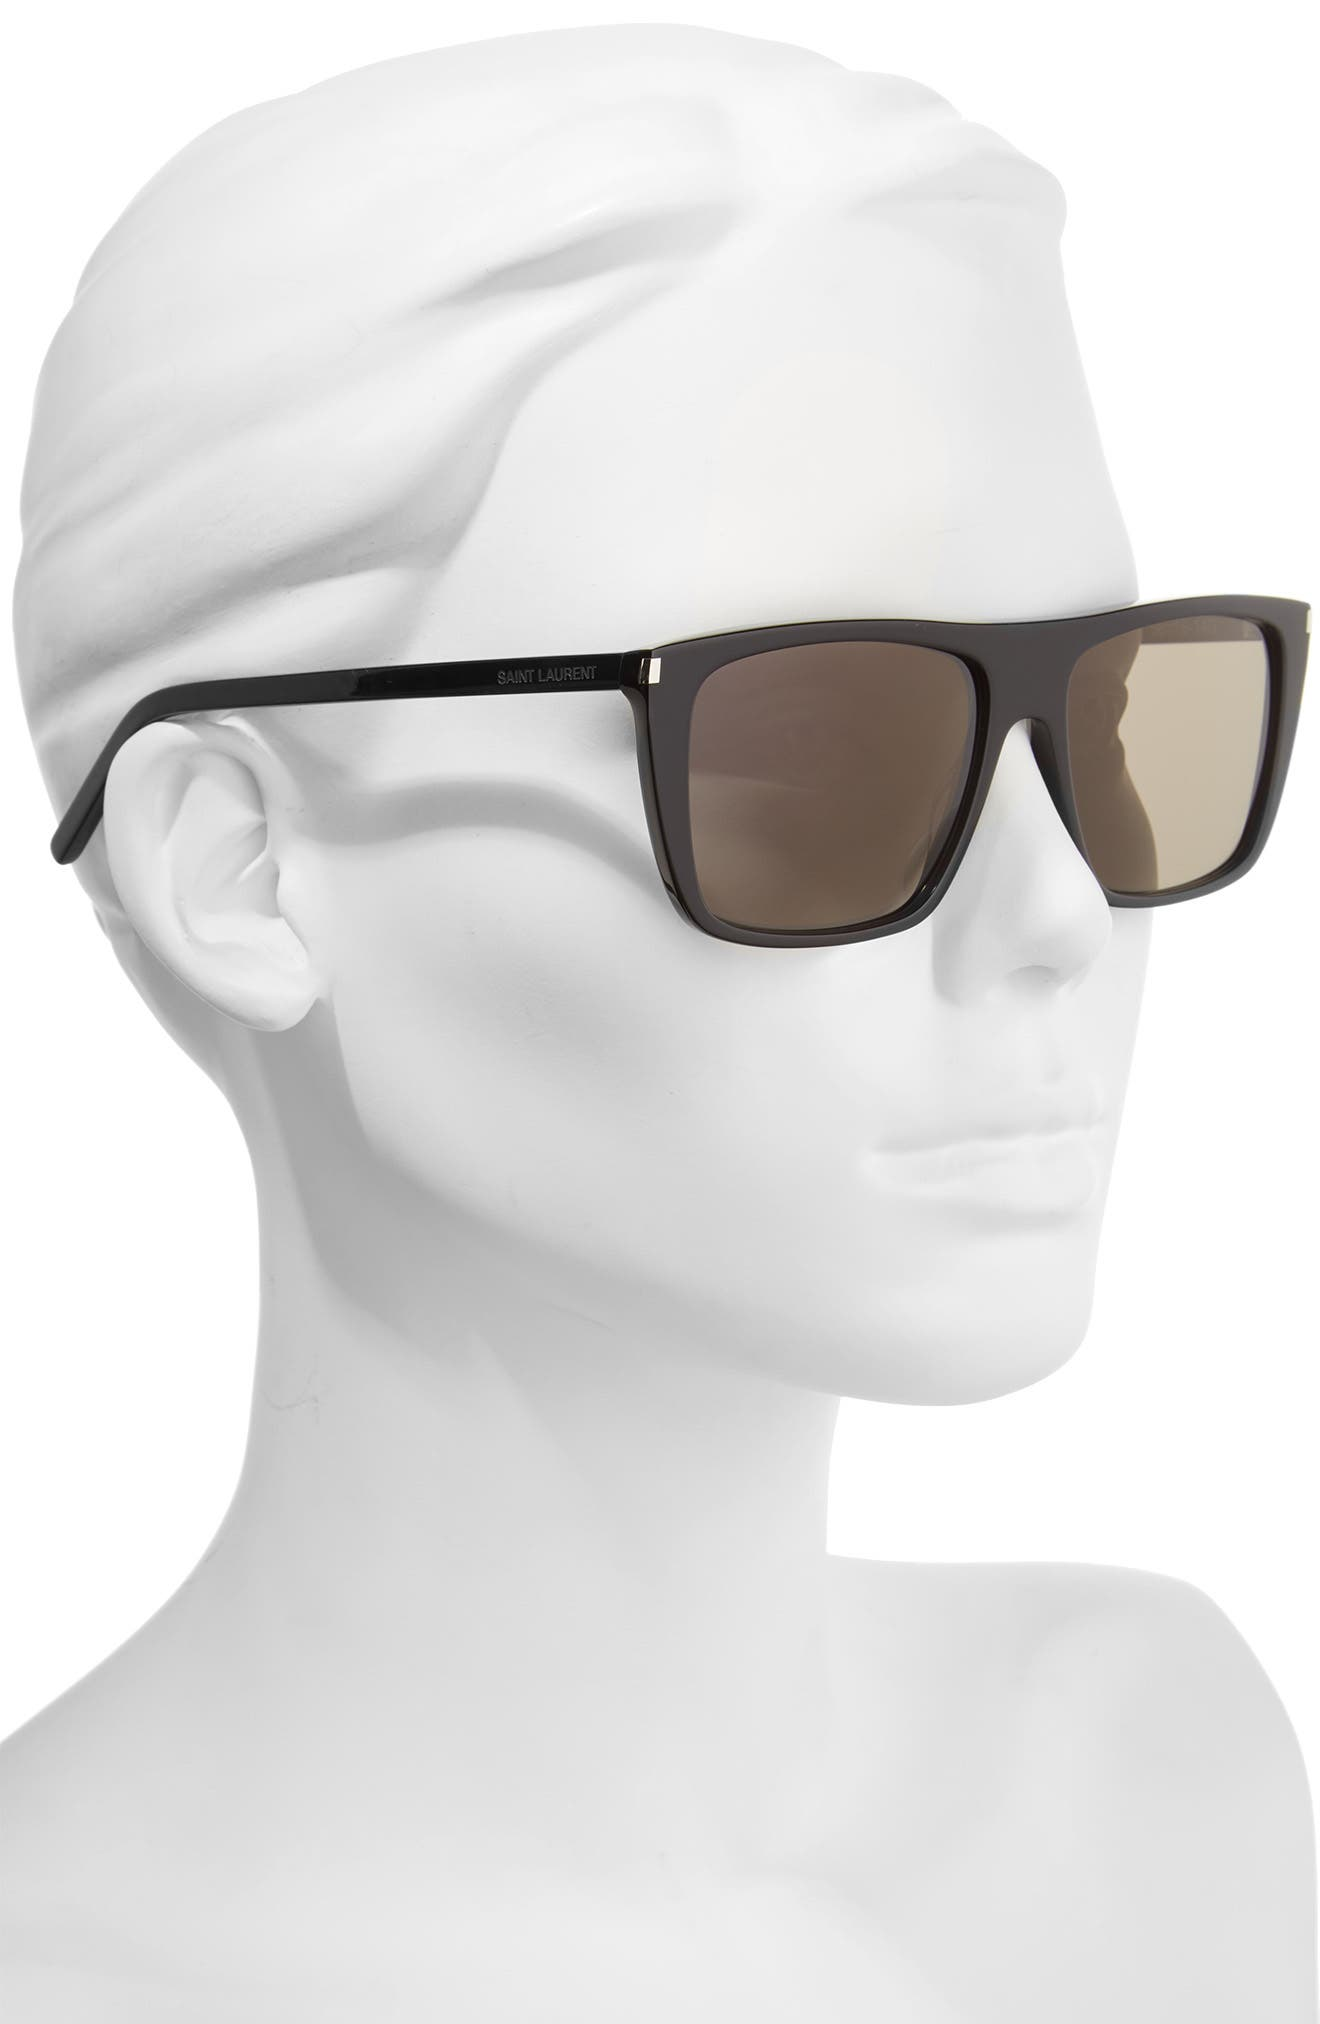 SAINT LAURENT, Avana 56mm Flat Top Sunglasses, Alternate thumbnail 2, color, 001